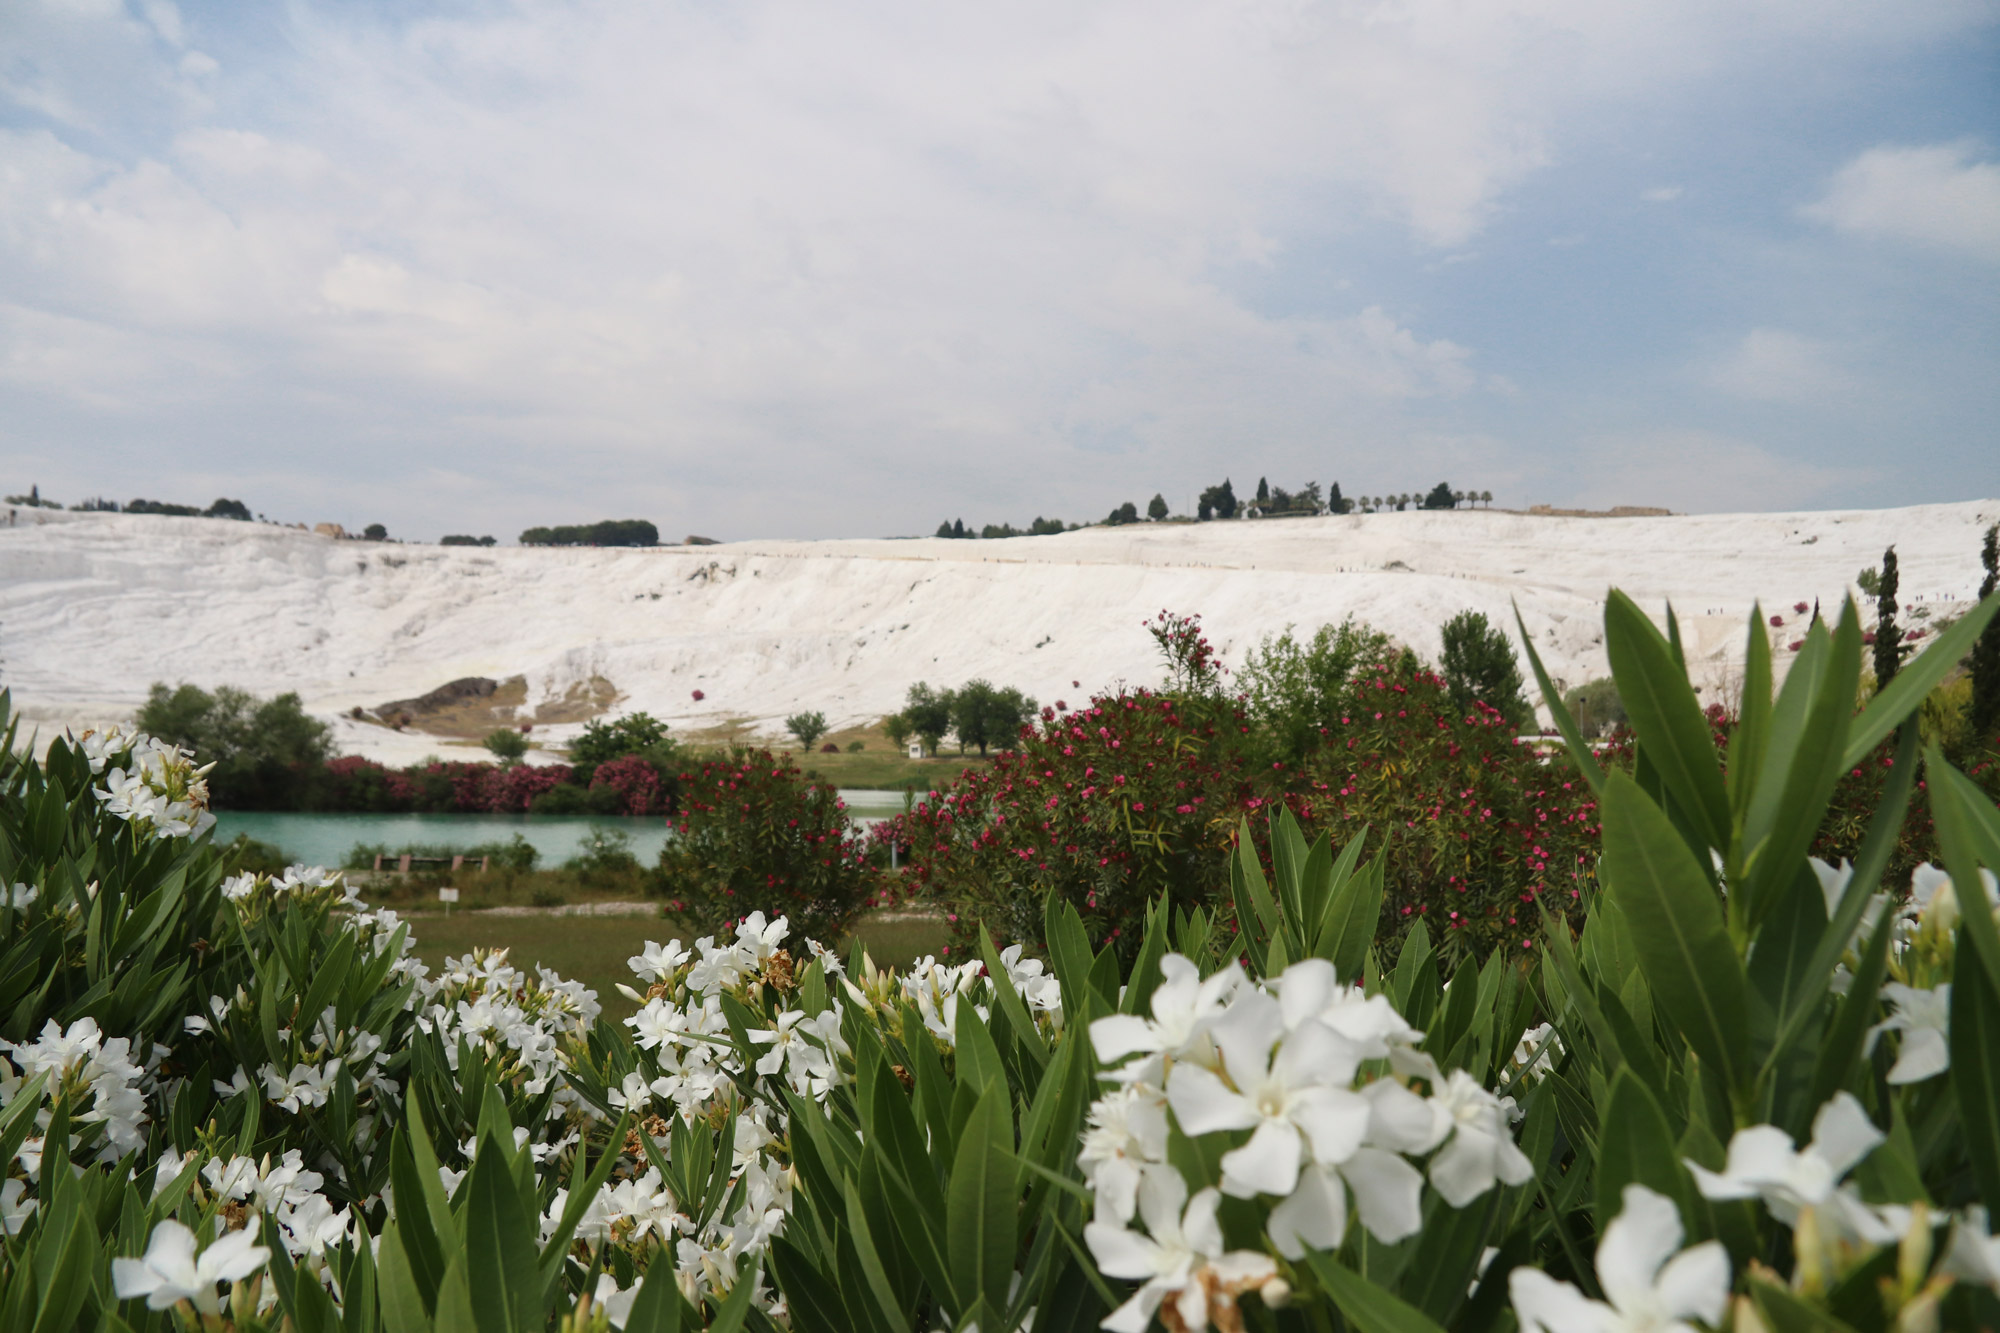 Turkije reisverslag: Pamukkale en Hiërapolis - Blik op Pamukkale